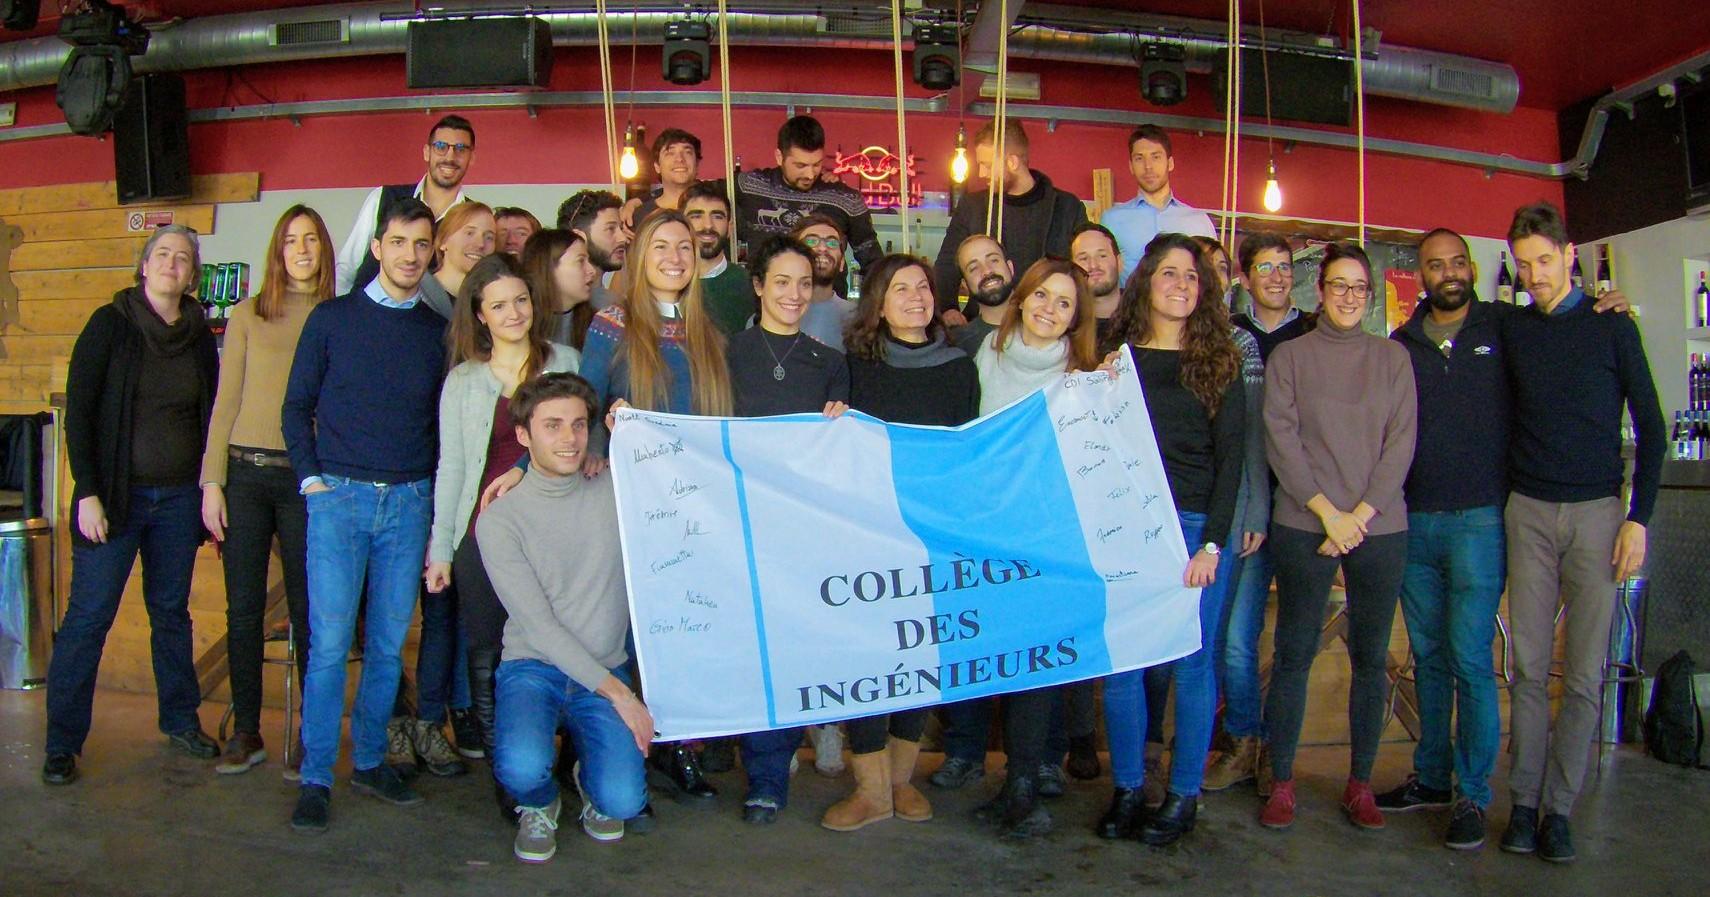 CDI Italia per Croce Rossa Italiana -Collège des Ingénieurs Italia